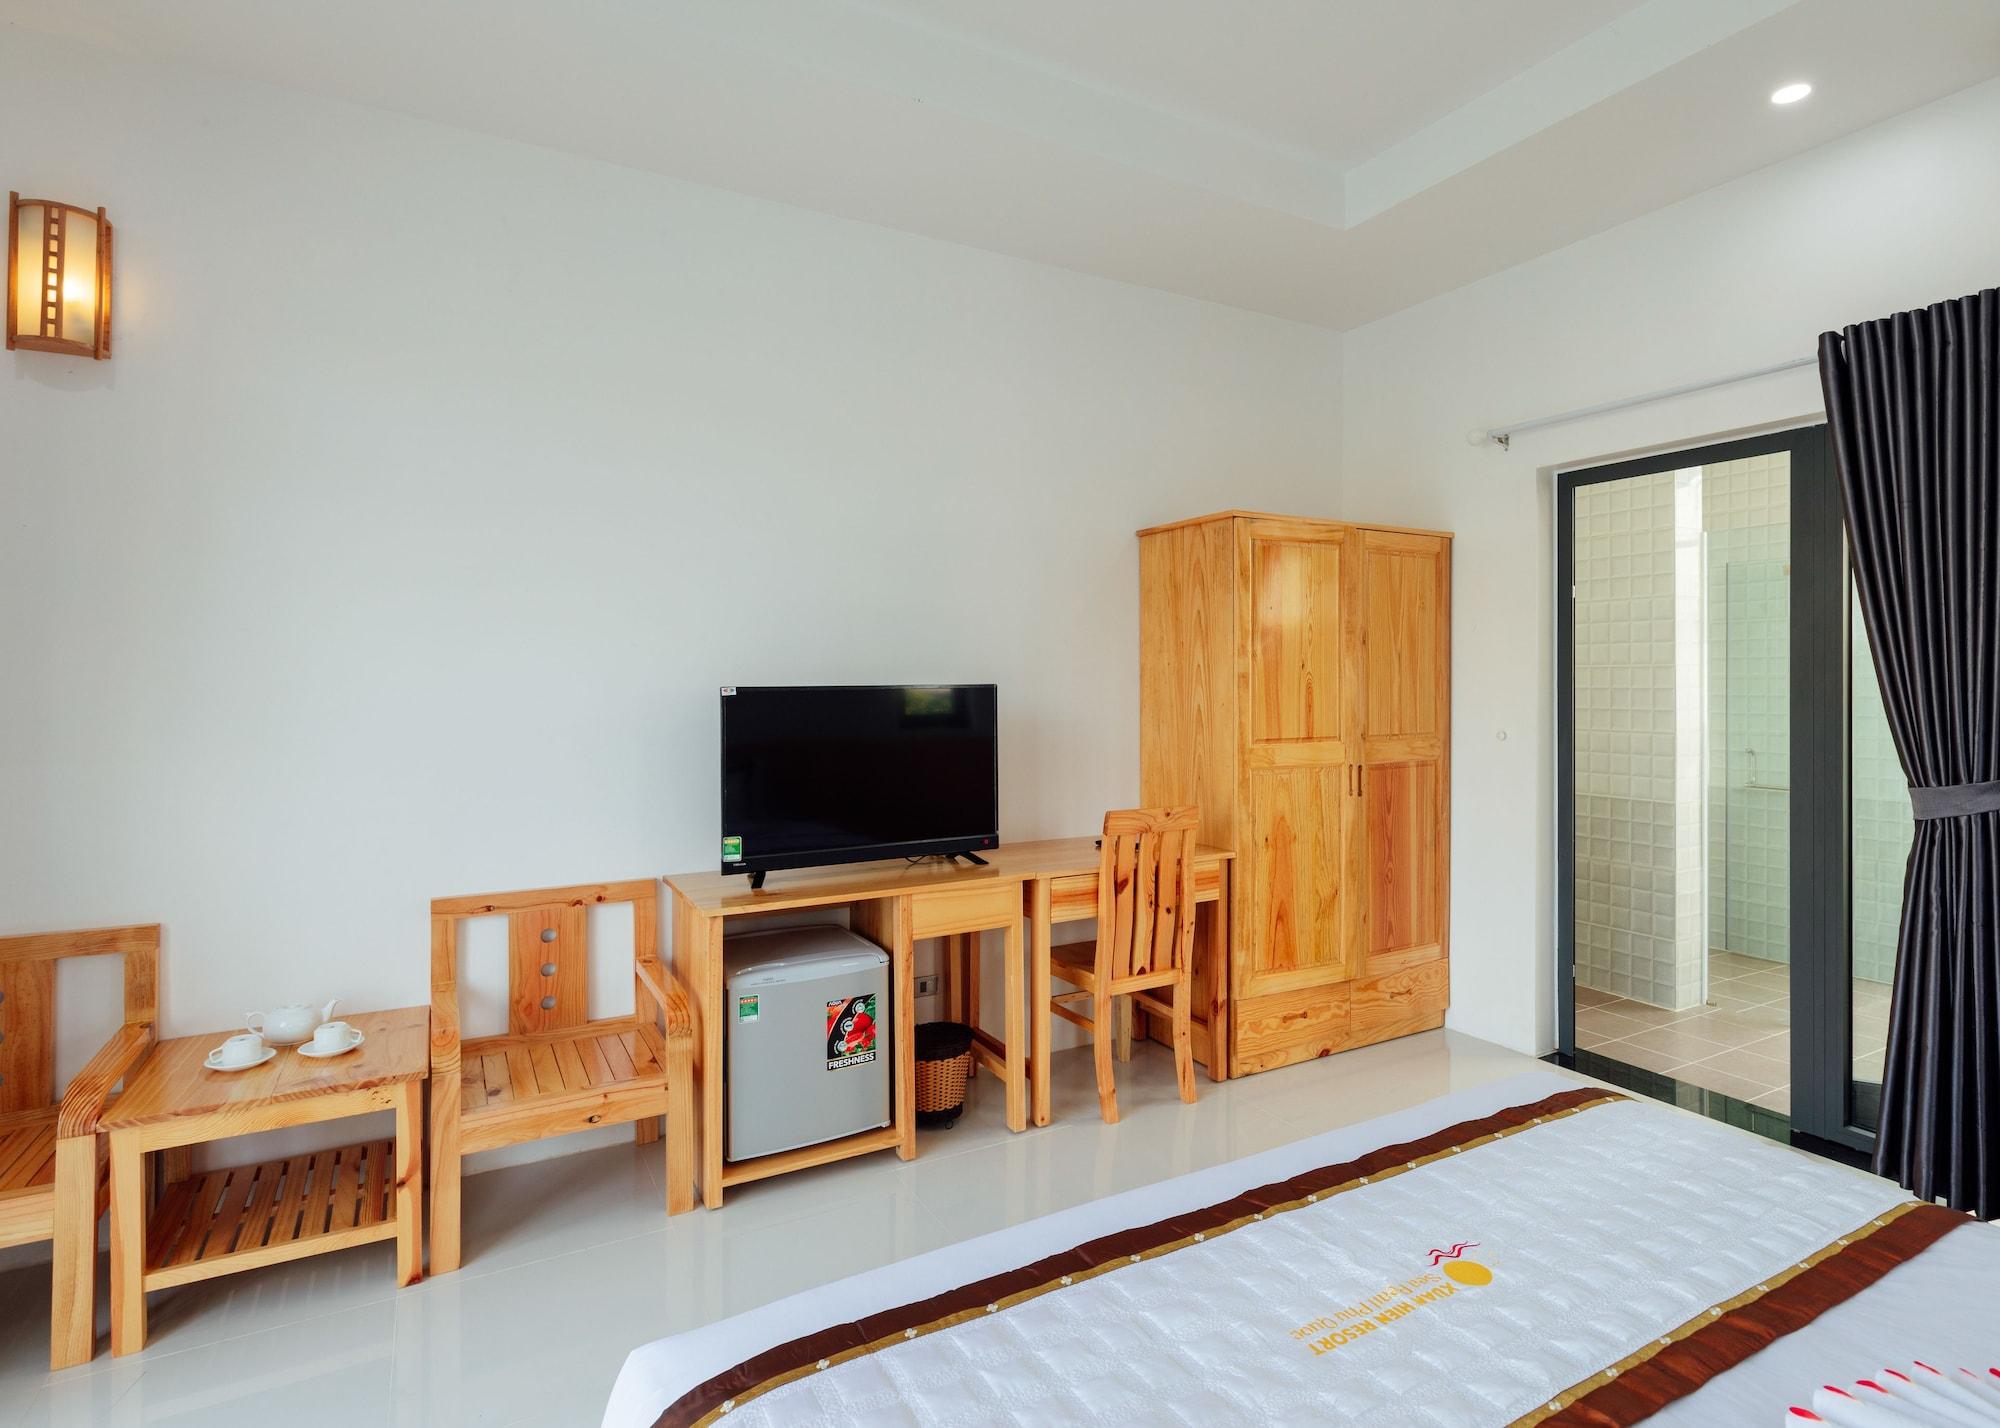 Xuan Hien Resort Seapearl Phu Quoc, Phú Quốc